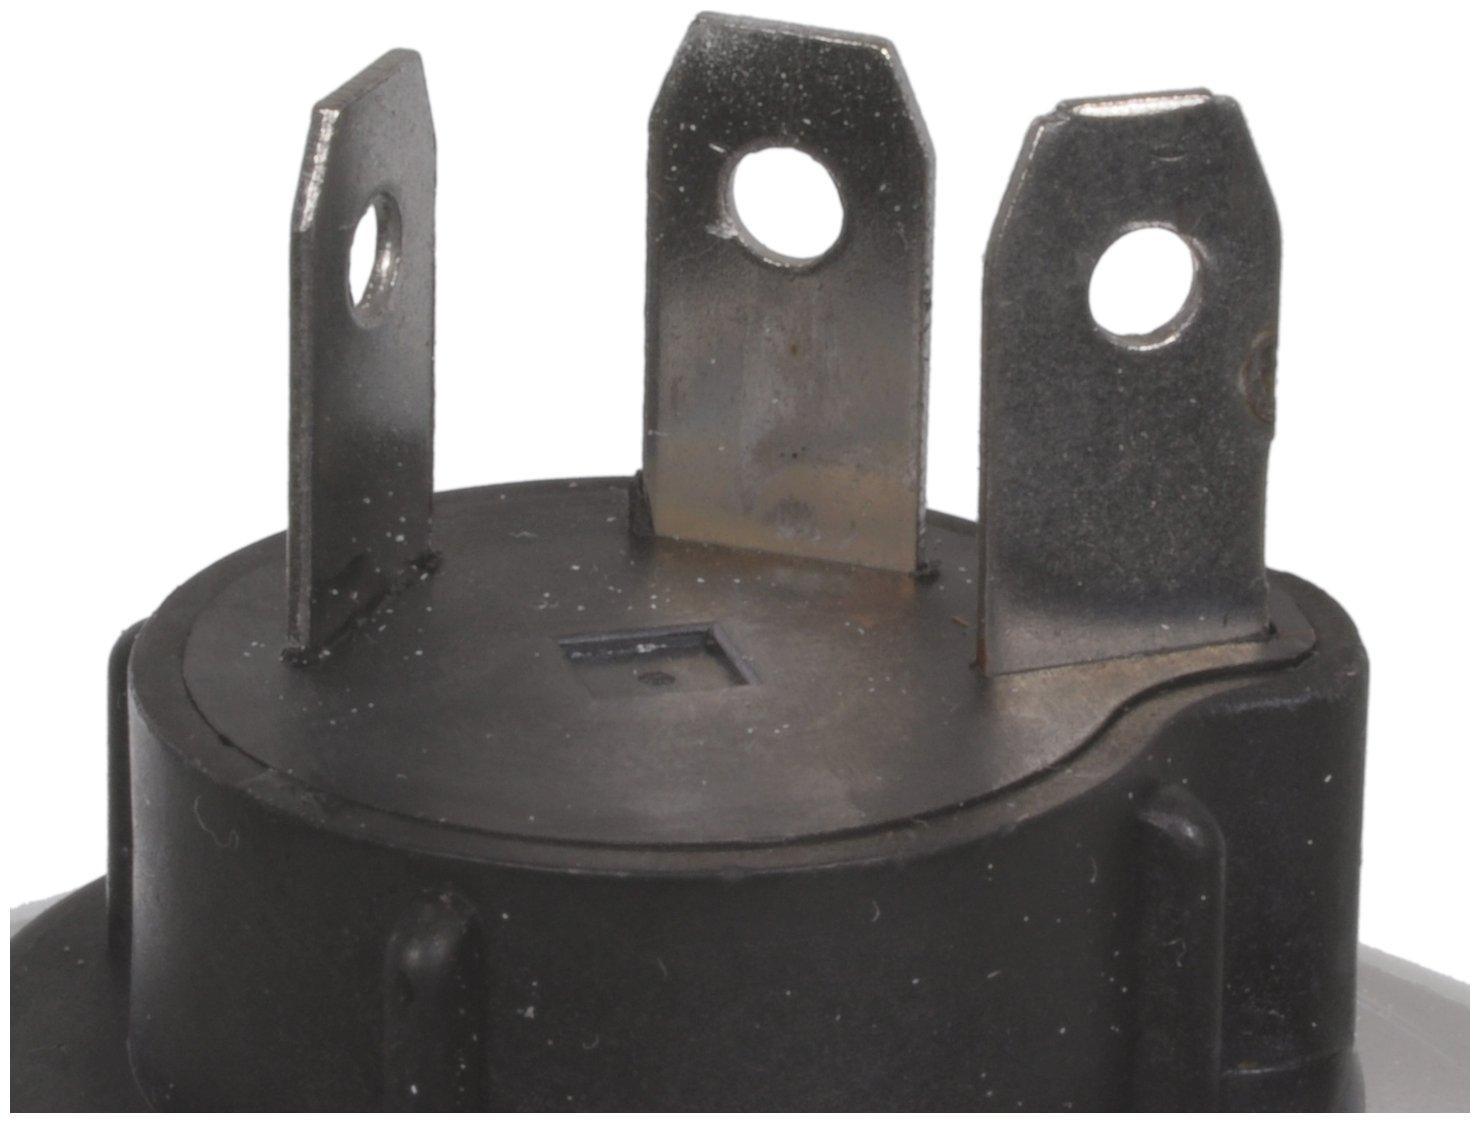 Amazon.com: Wagner Lighting H6545 BriteLite Sealed Beam - Box of 1: Automotive